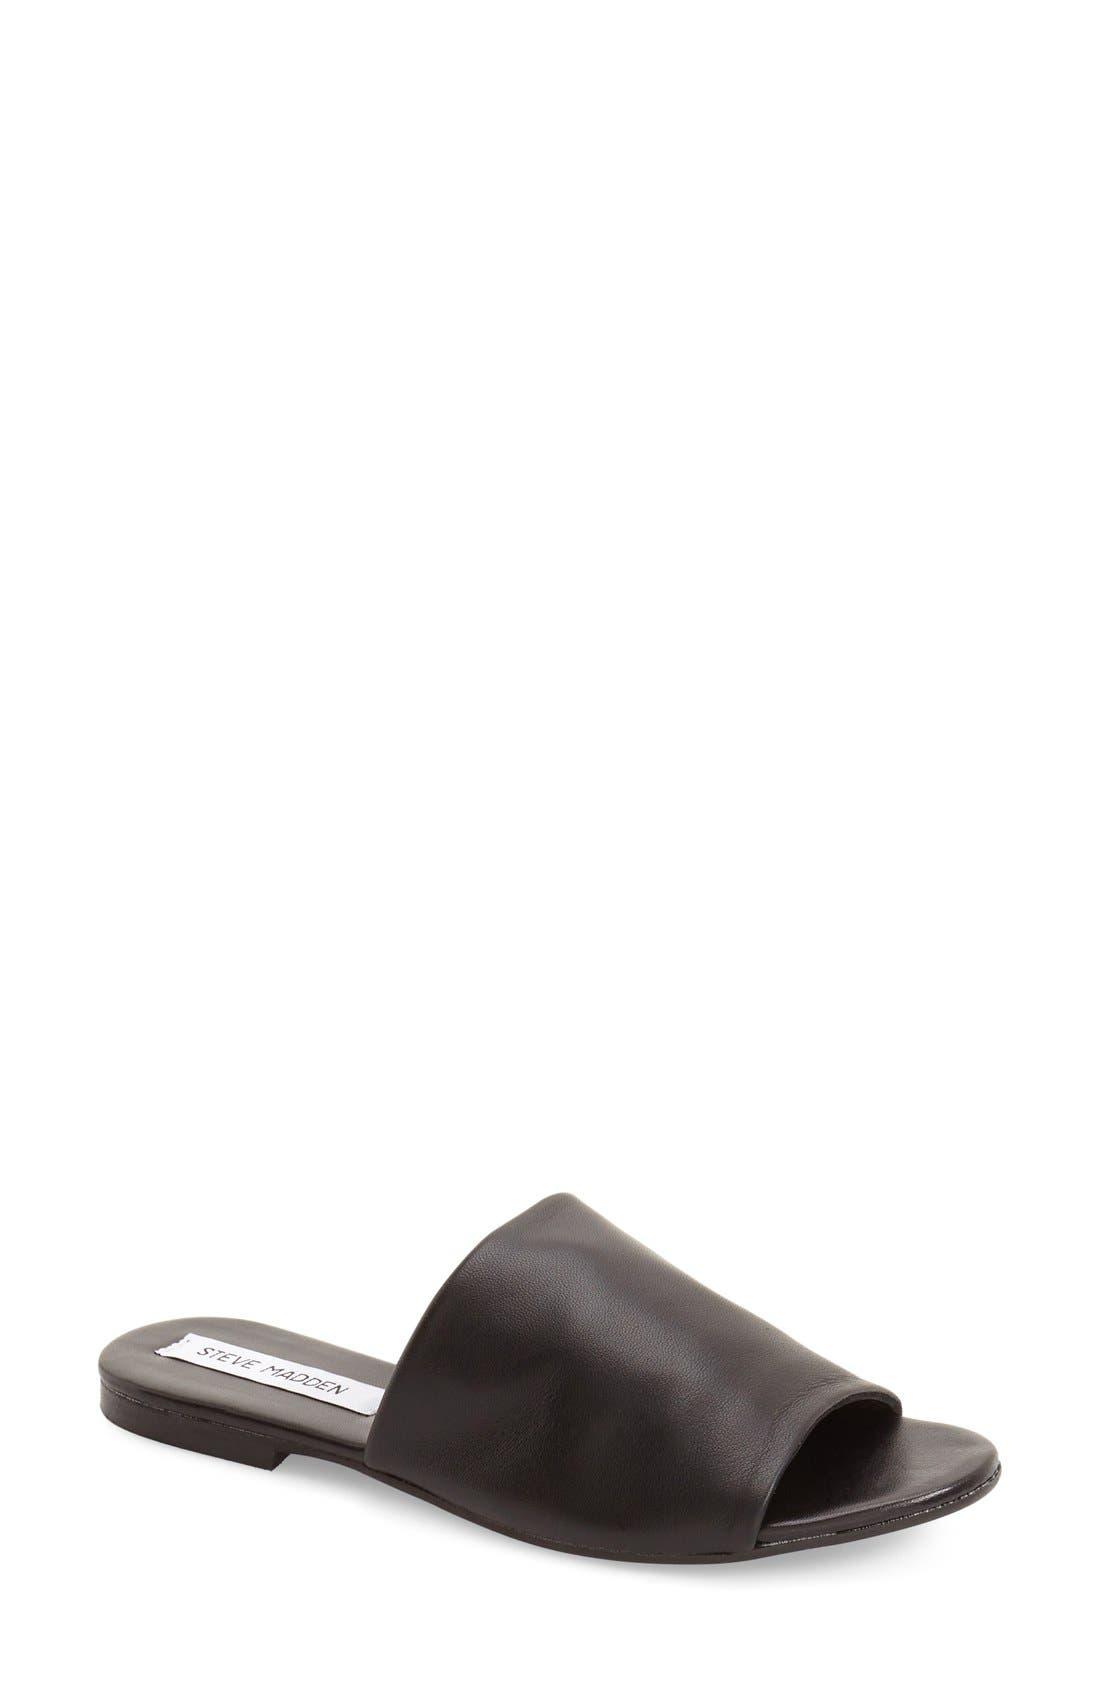 'Slidur' Slide Sandal,                         Main,                         color, 001